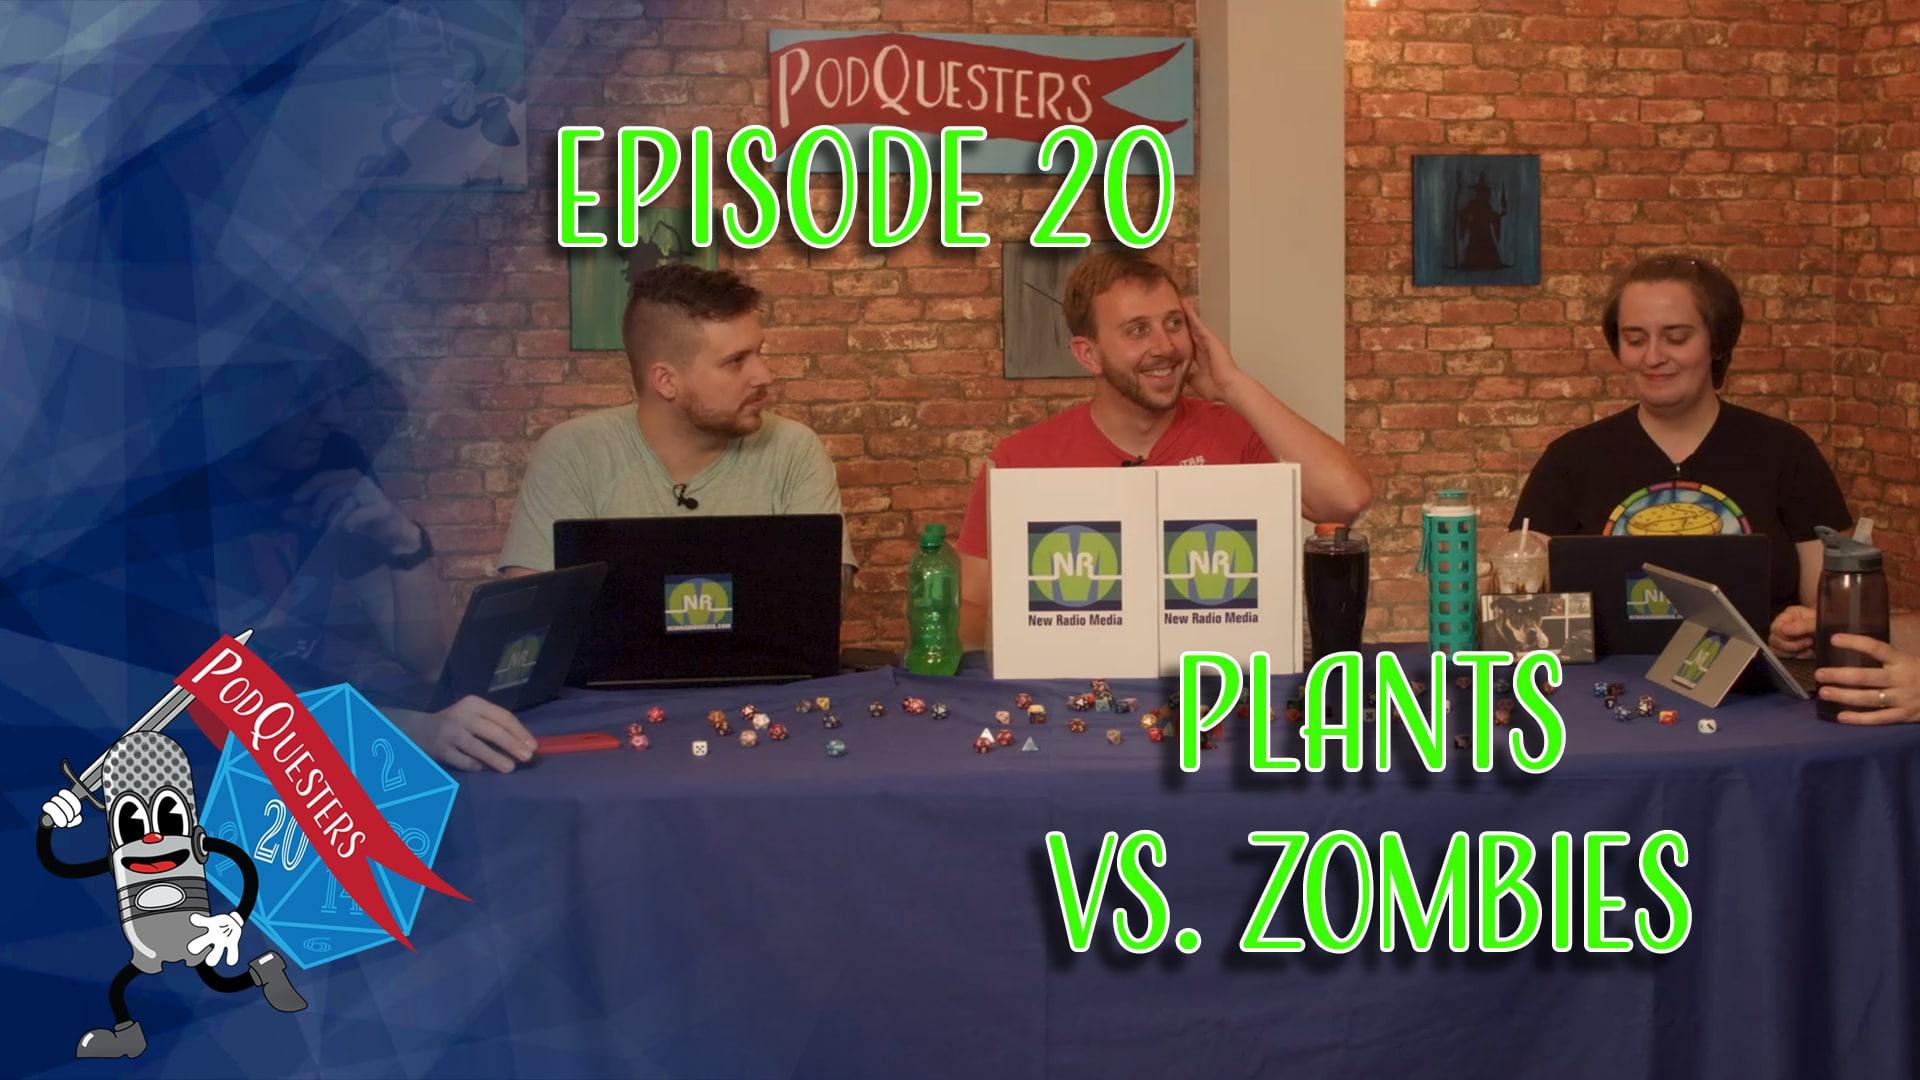 Podquesters - Episode 20: Plants Vs. Zombies